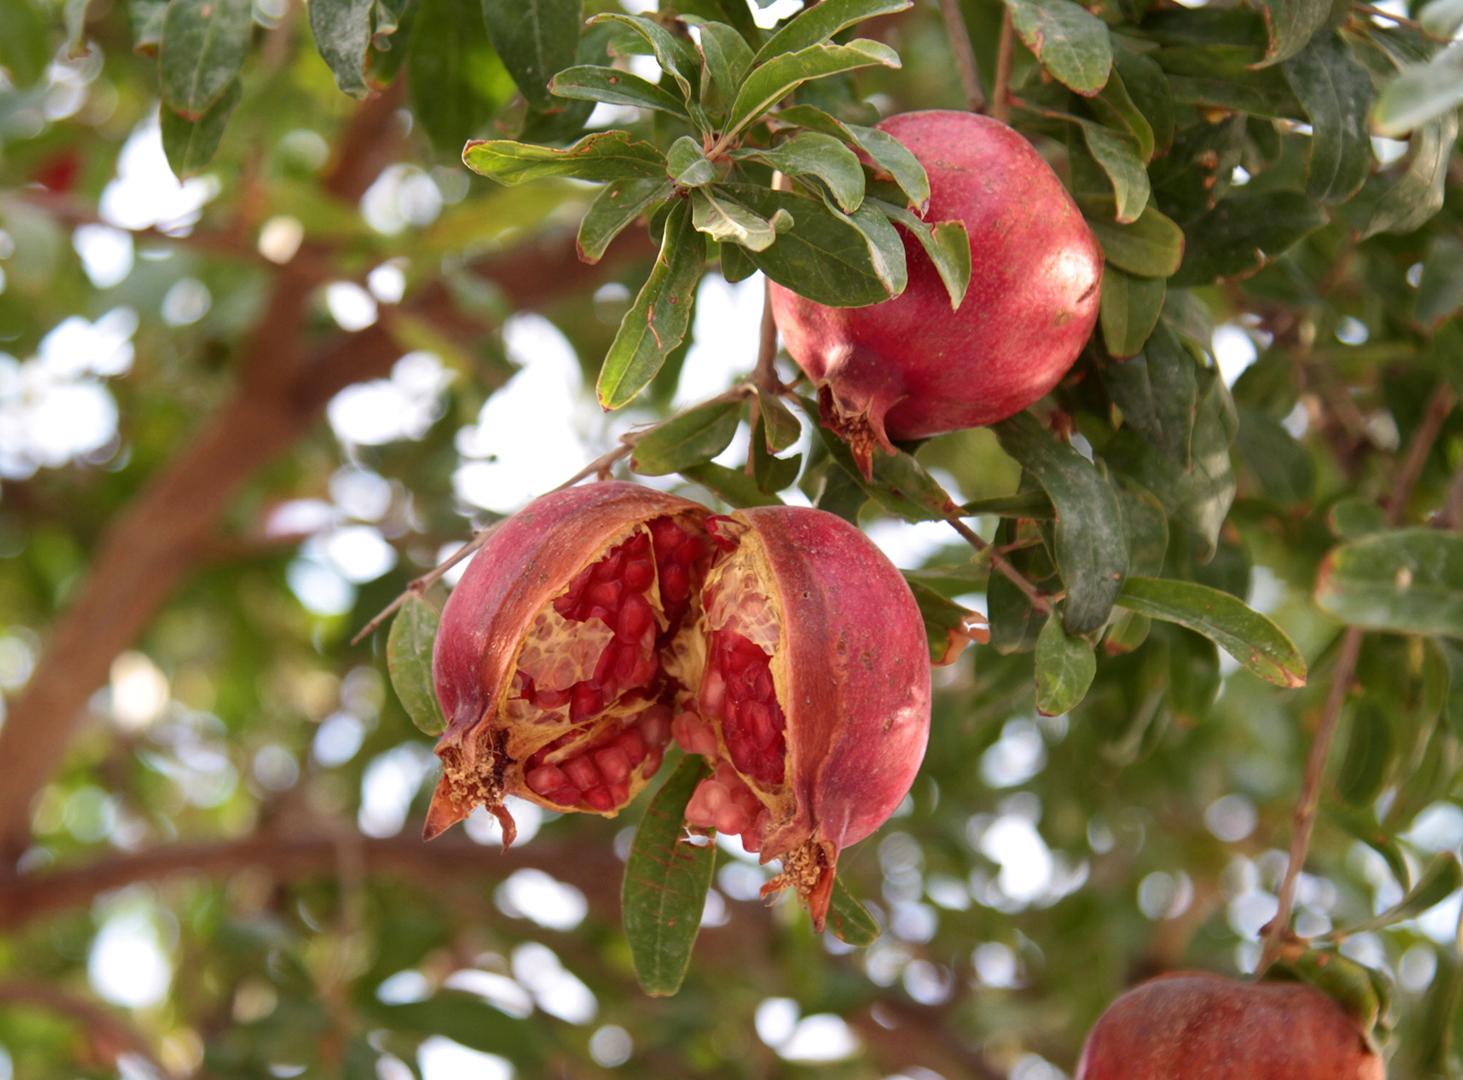 Eternity Hidden In Red Arils Of Pomegranate Thenewcrete